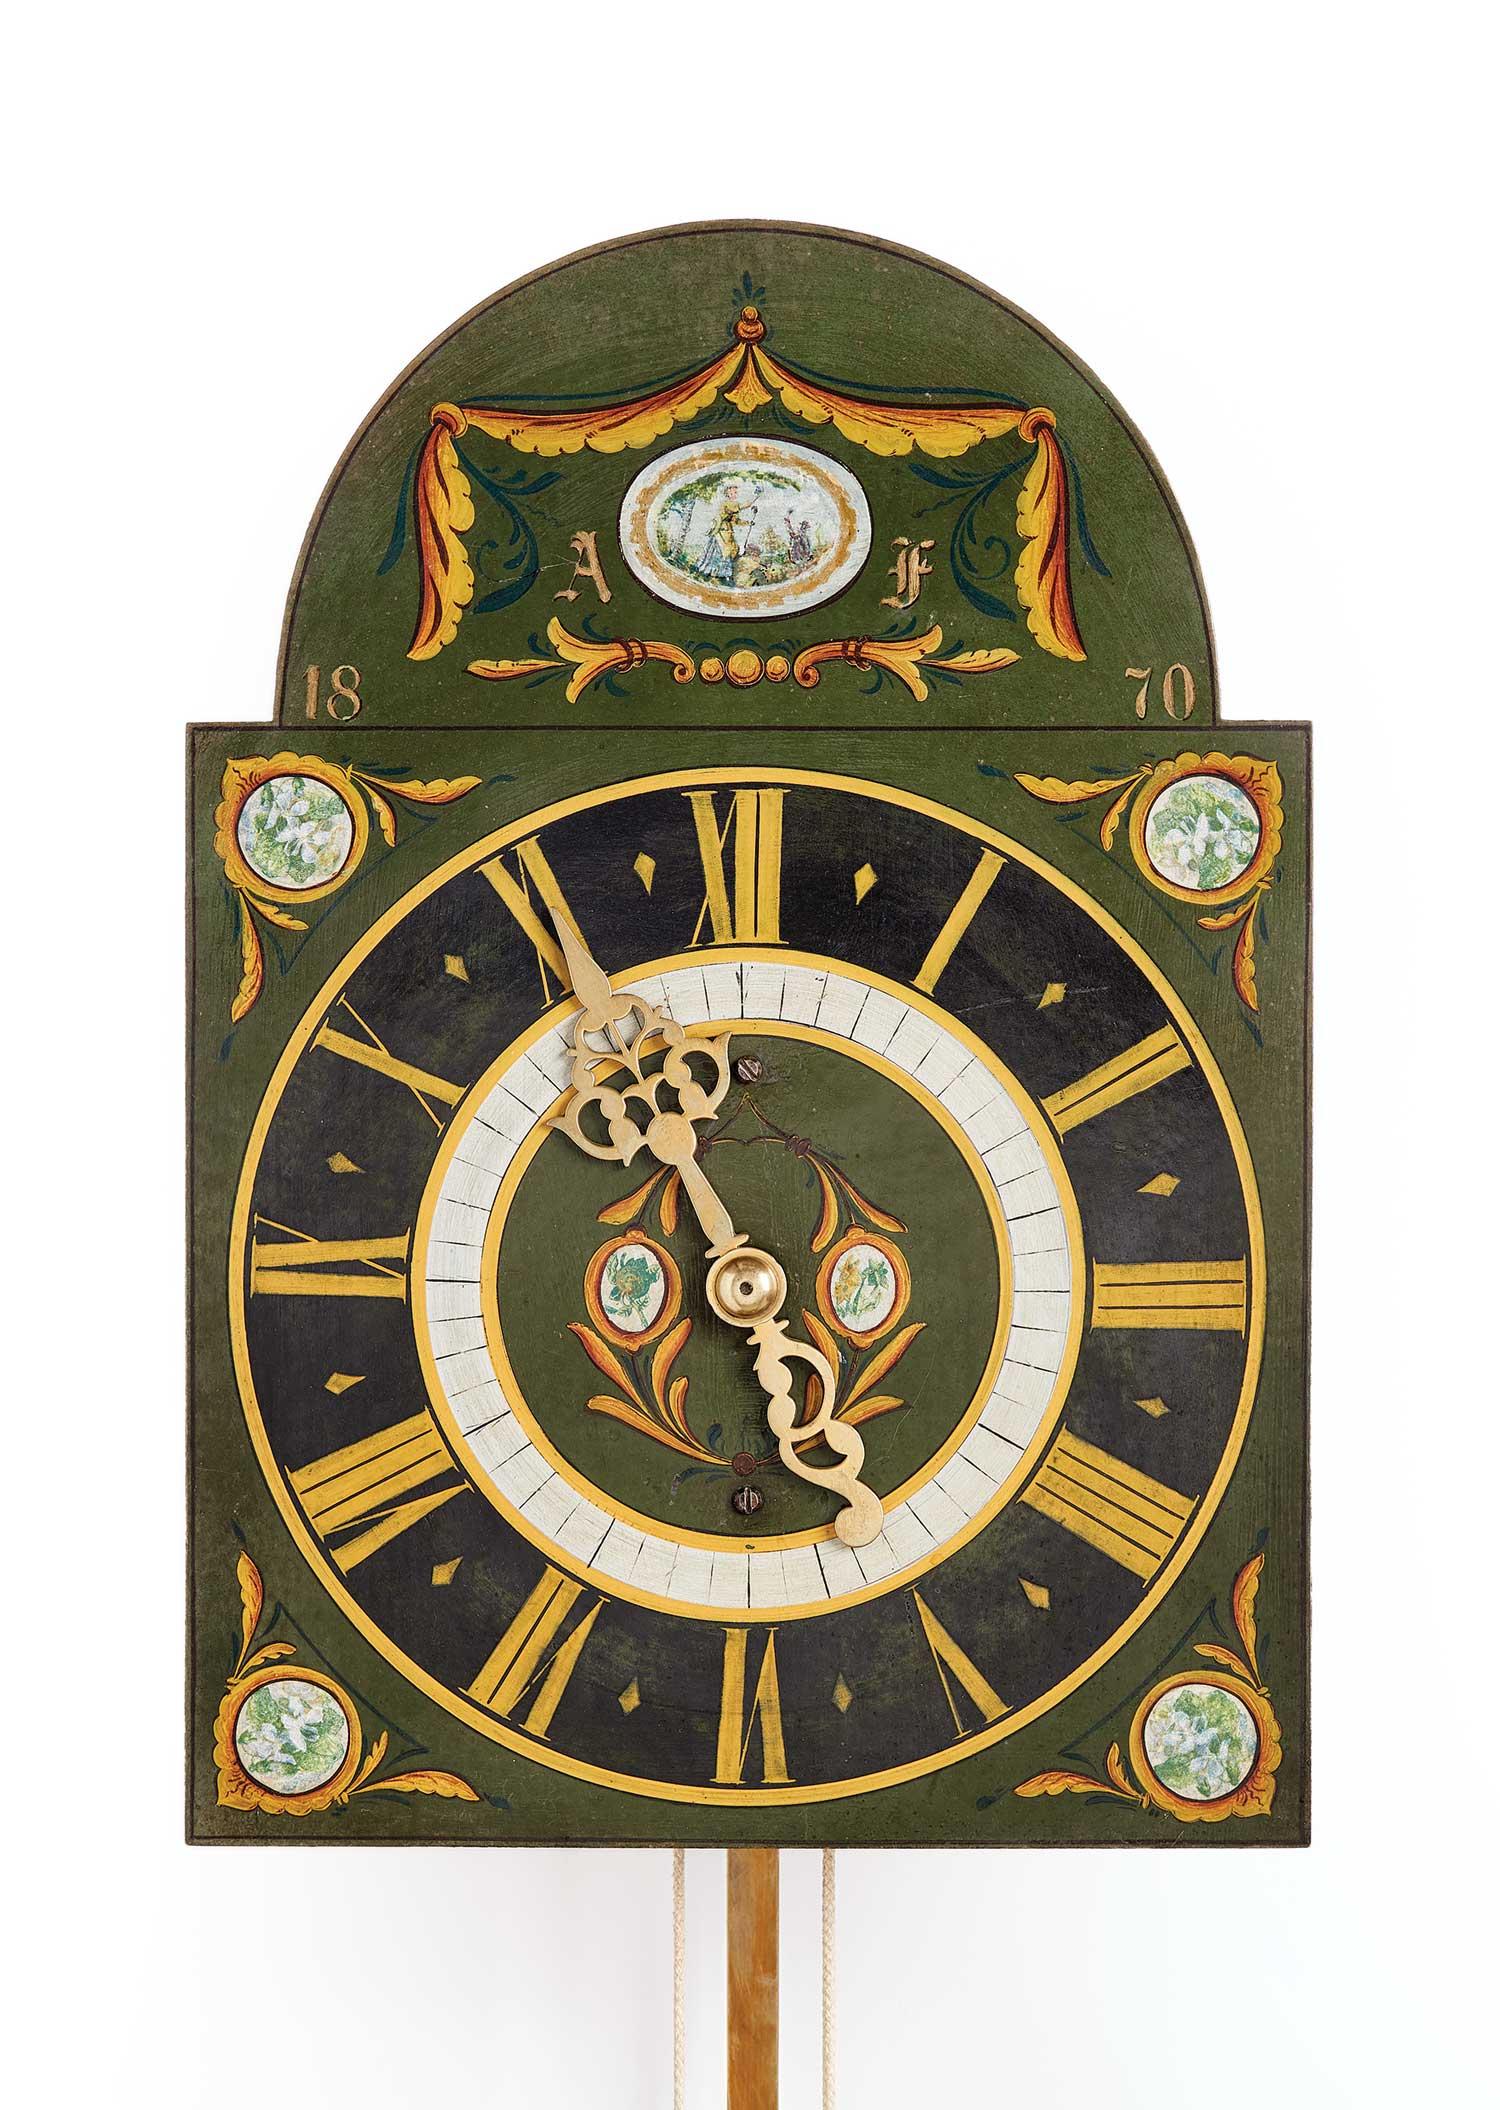 mandtler-clock-1870-mennonite-mc0220.jpg